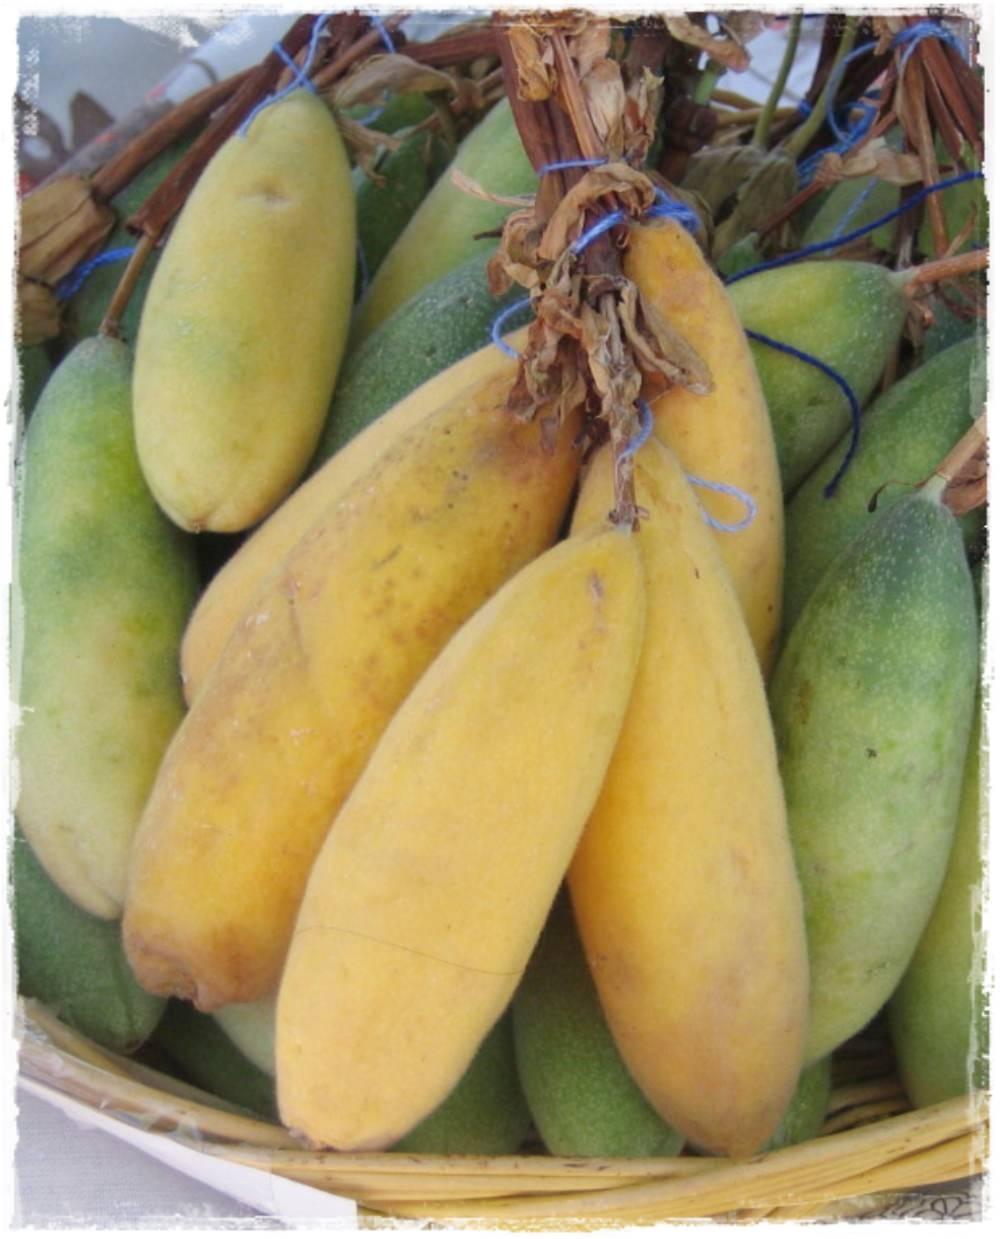 banana passionfruit passion FRUIT passiflora mollissima edible 50 seeds